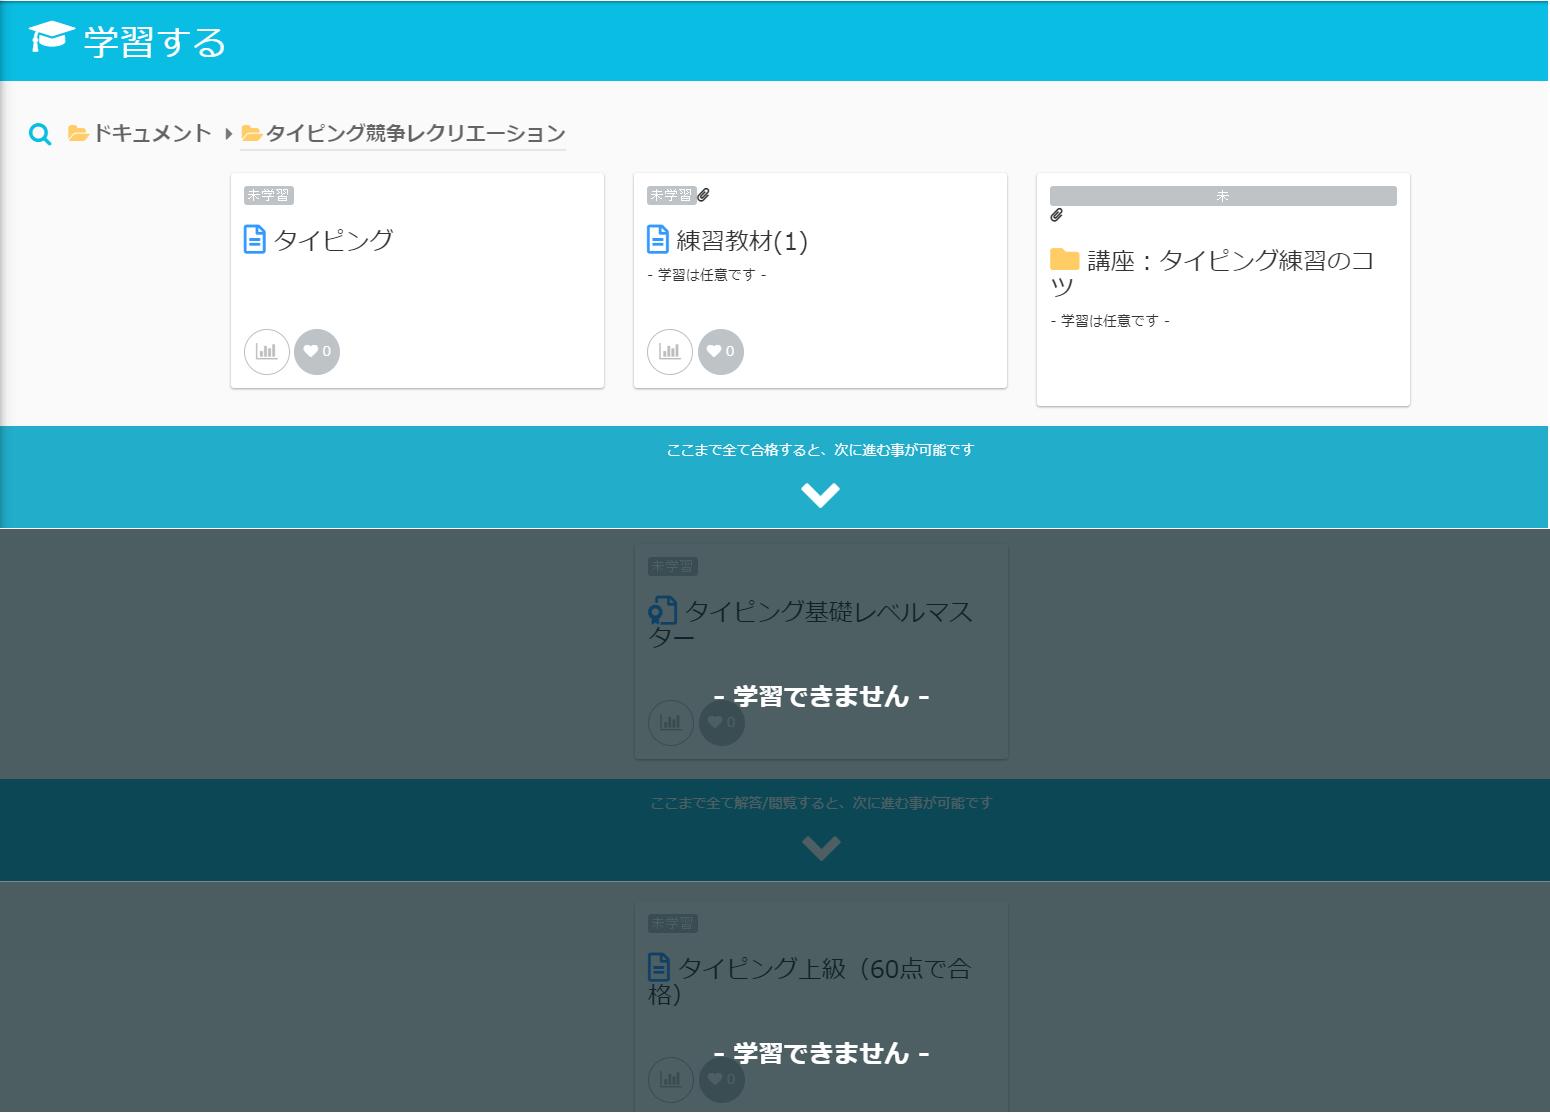 learningBOX_タイピング教材_コース設定